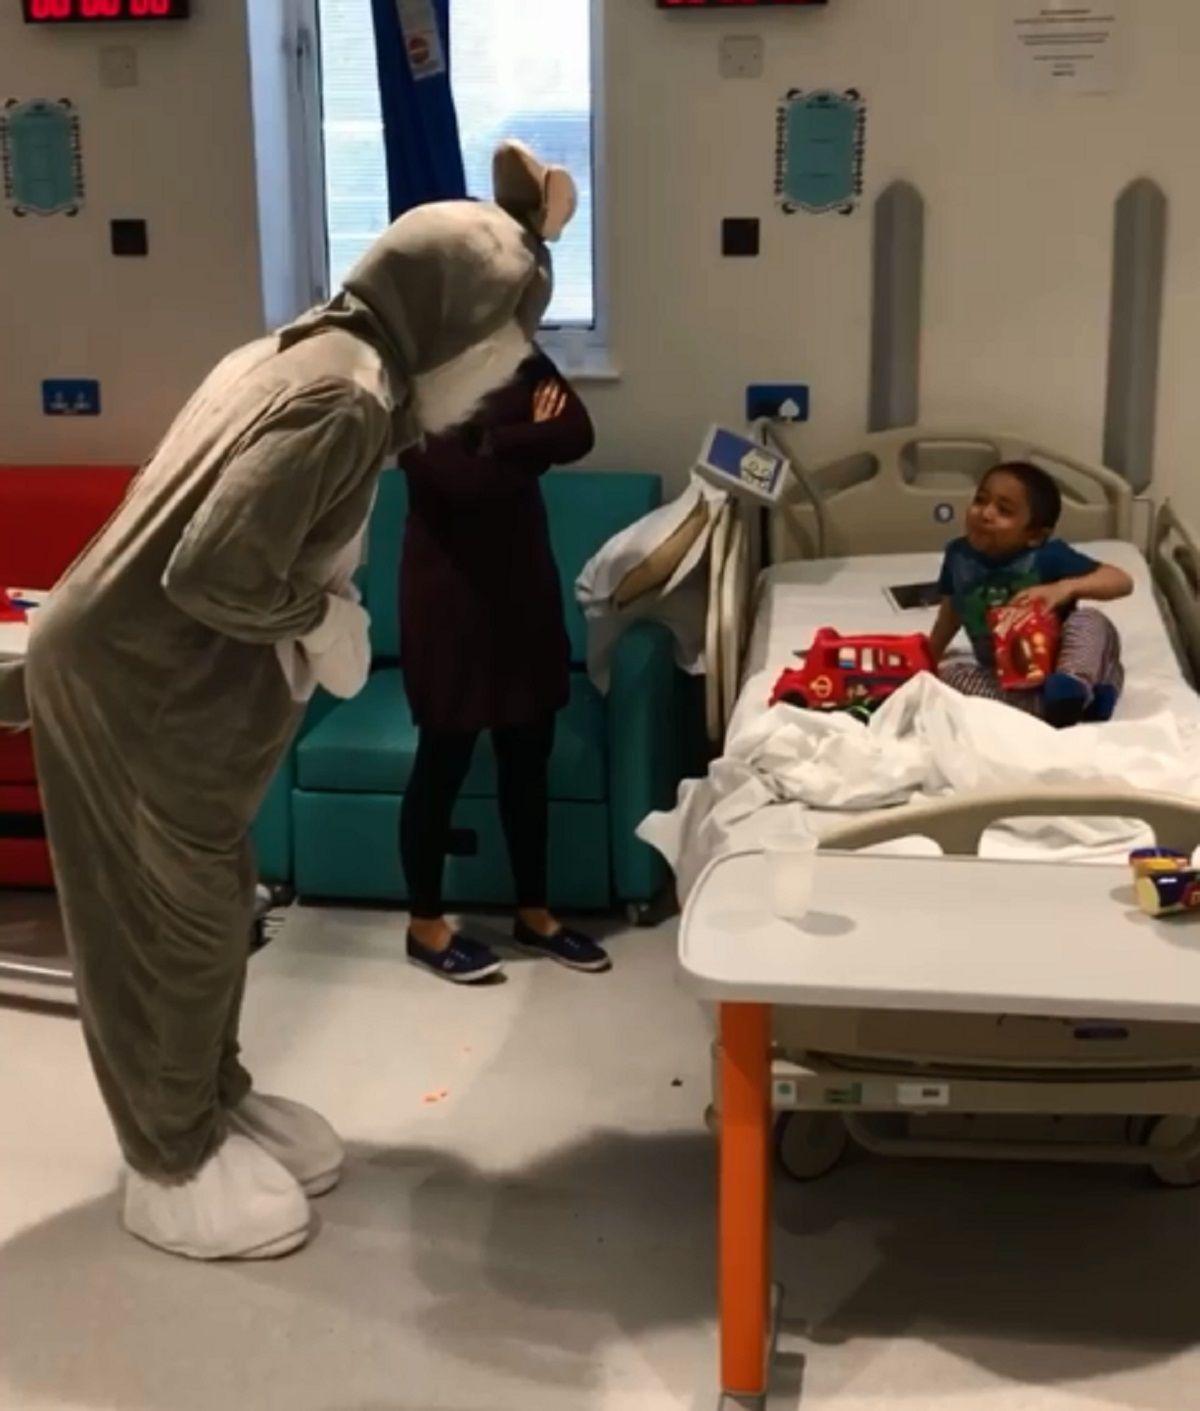 El francés Patrice Evra se disfrazó de conejo y visitó un hospital infantil